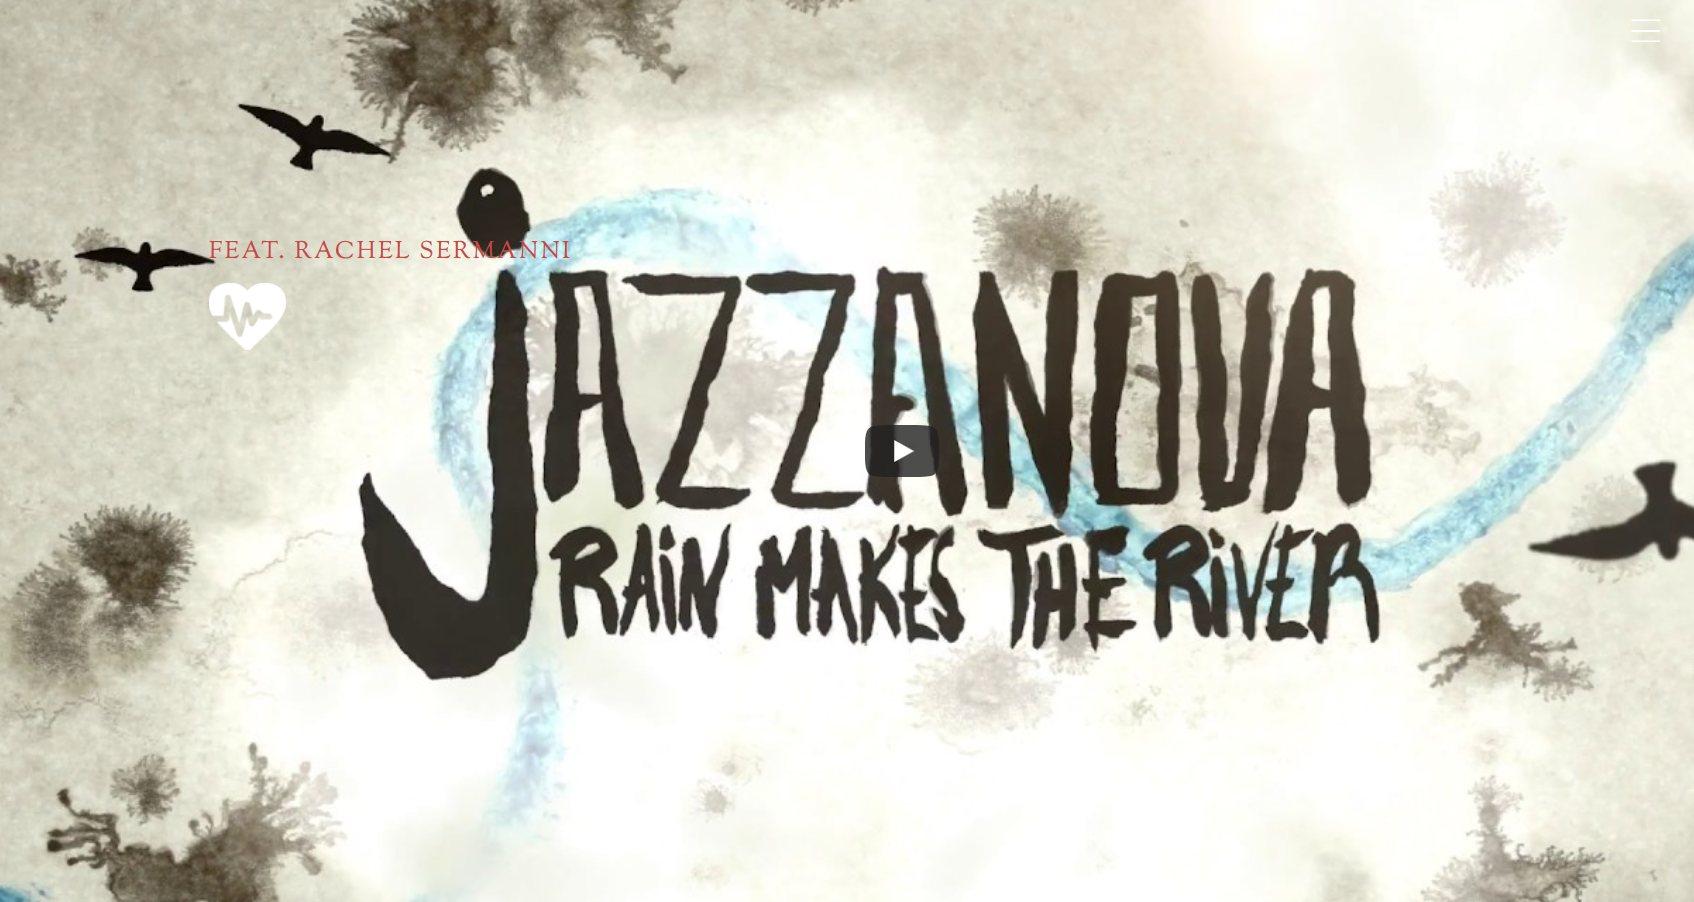 Jazzanova_screenweaver_media_2018-08-18